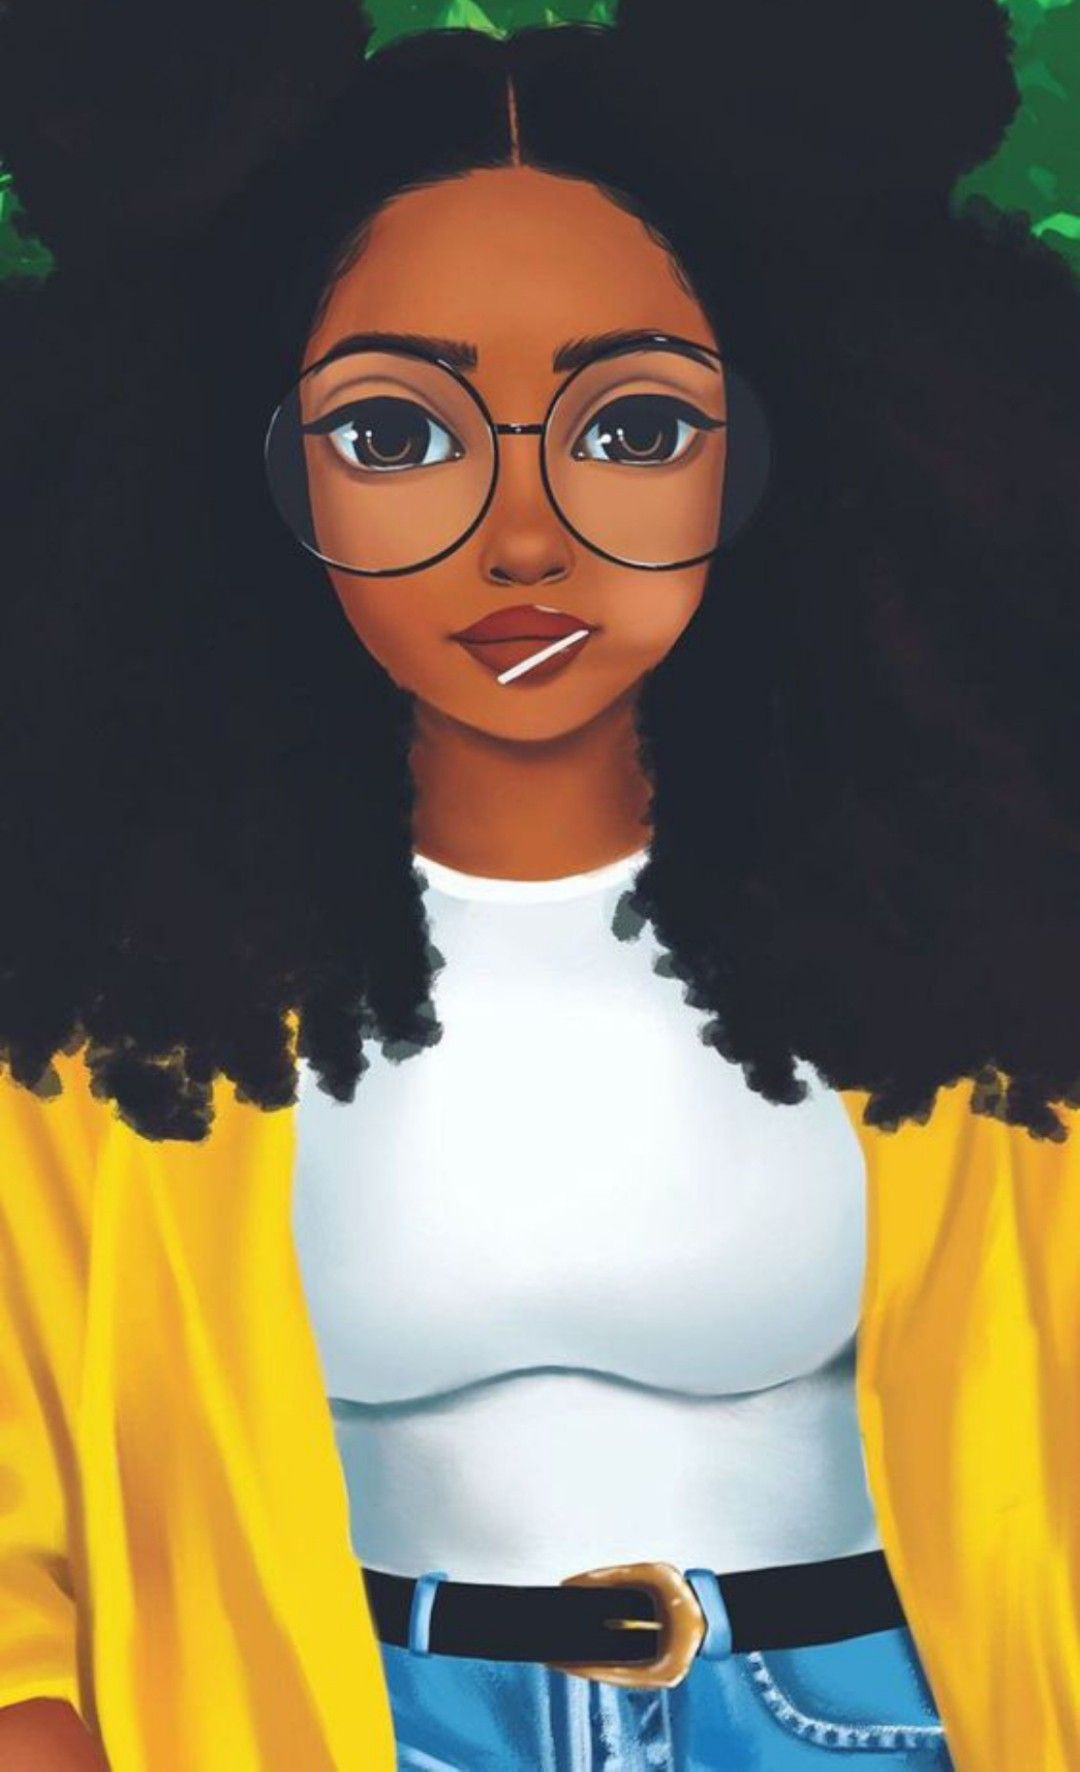 Hd Girly Wallpaper Cute Wallpaper Girl Drawings Of Black Girls Black Girl Art Cute Girl Wallpaper